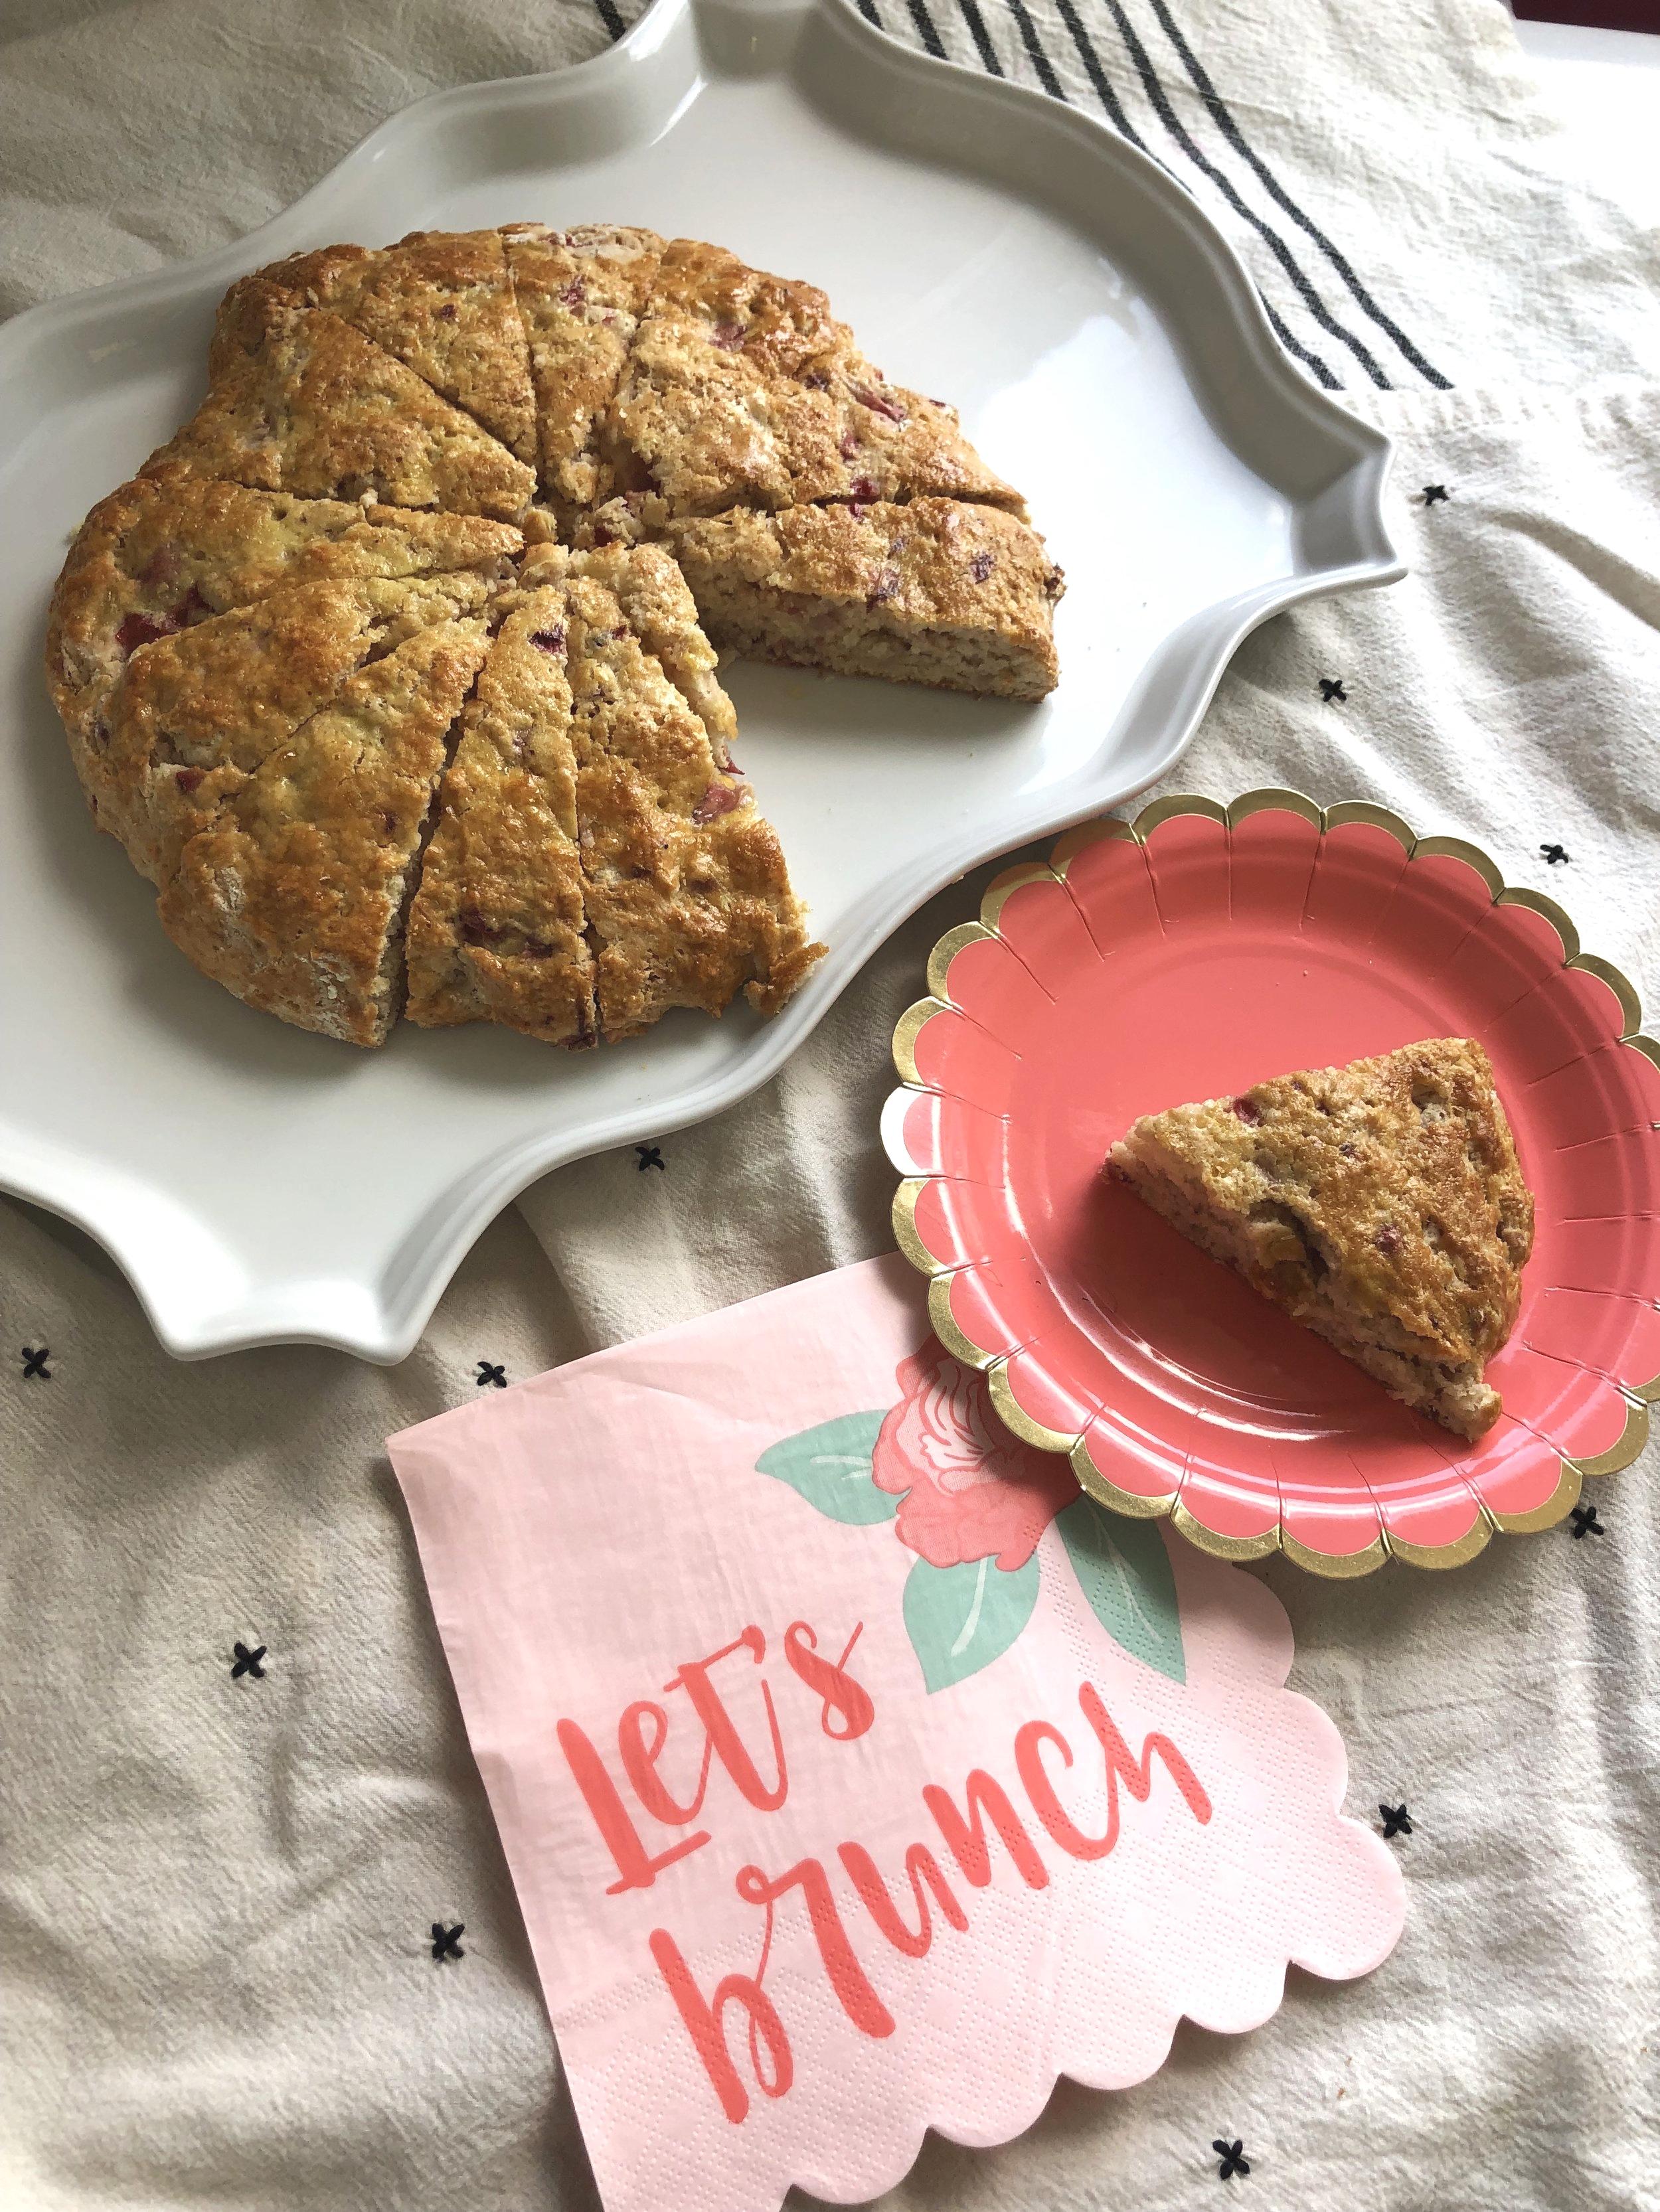 Strawberry+Scones+to+rock+your+Mother%27s+Day+breakfast.+www.ChefShayna.jpg